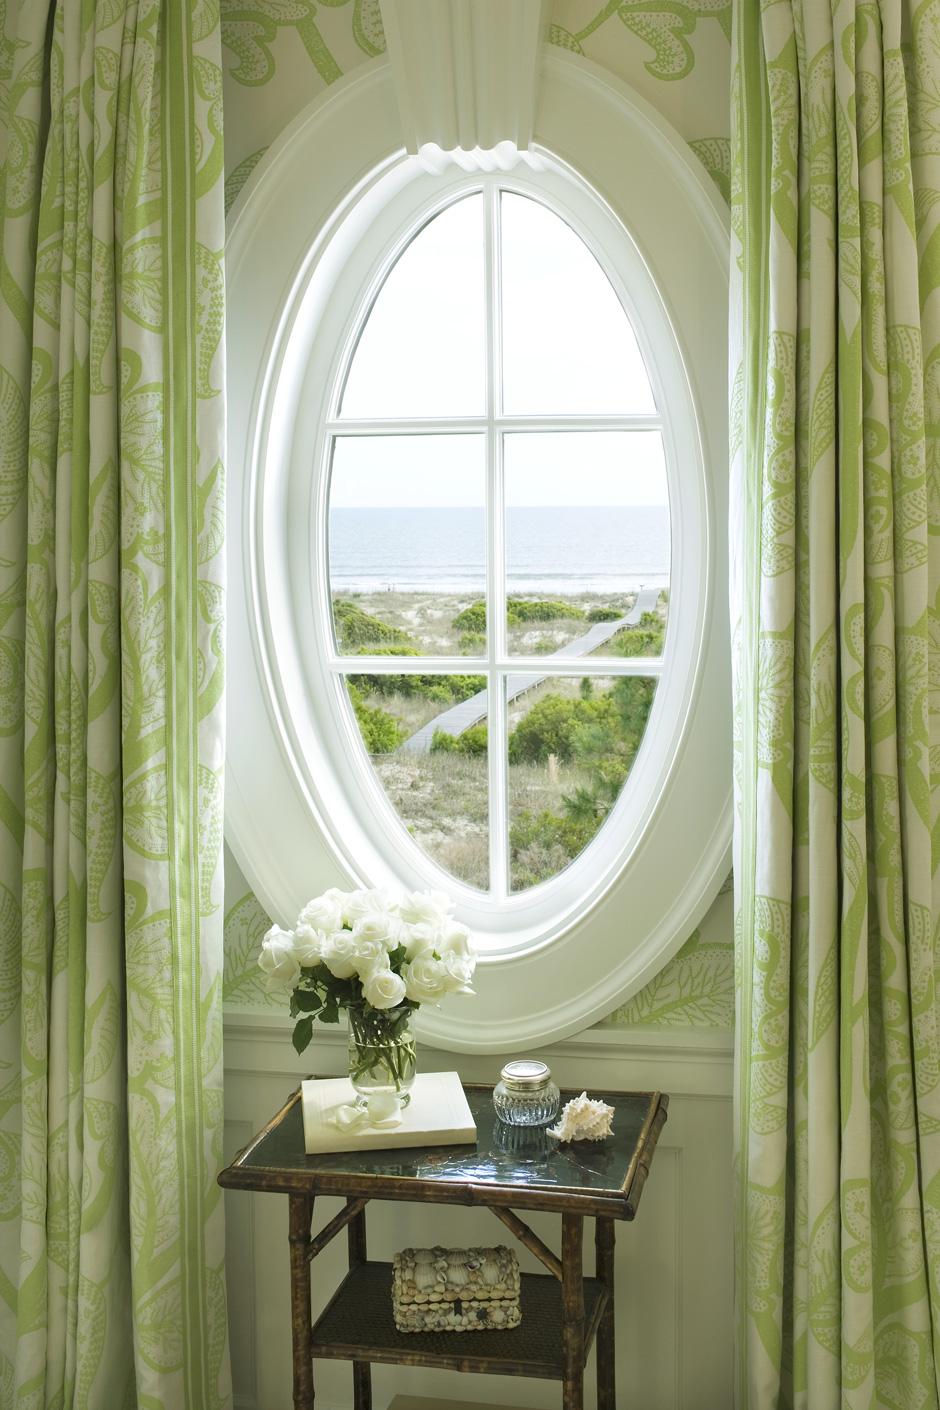 window-016272